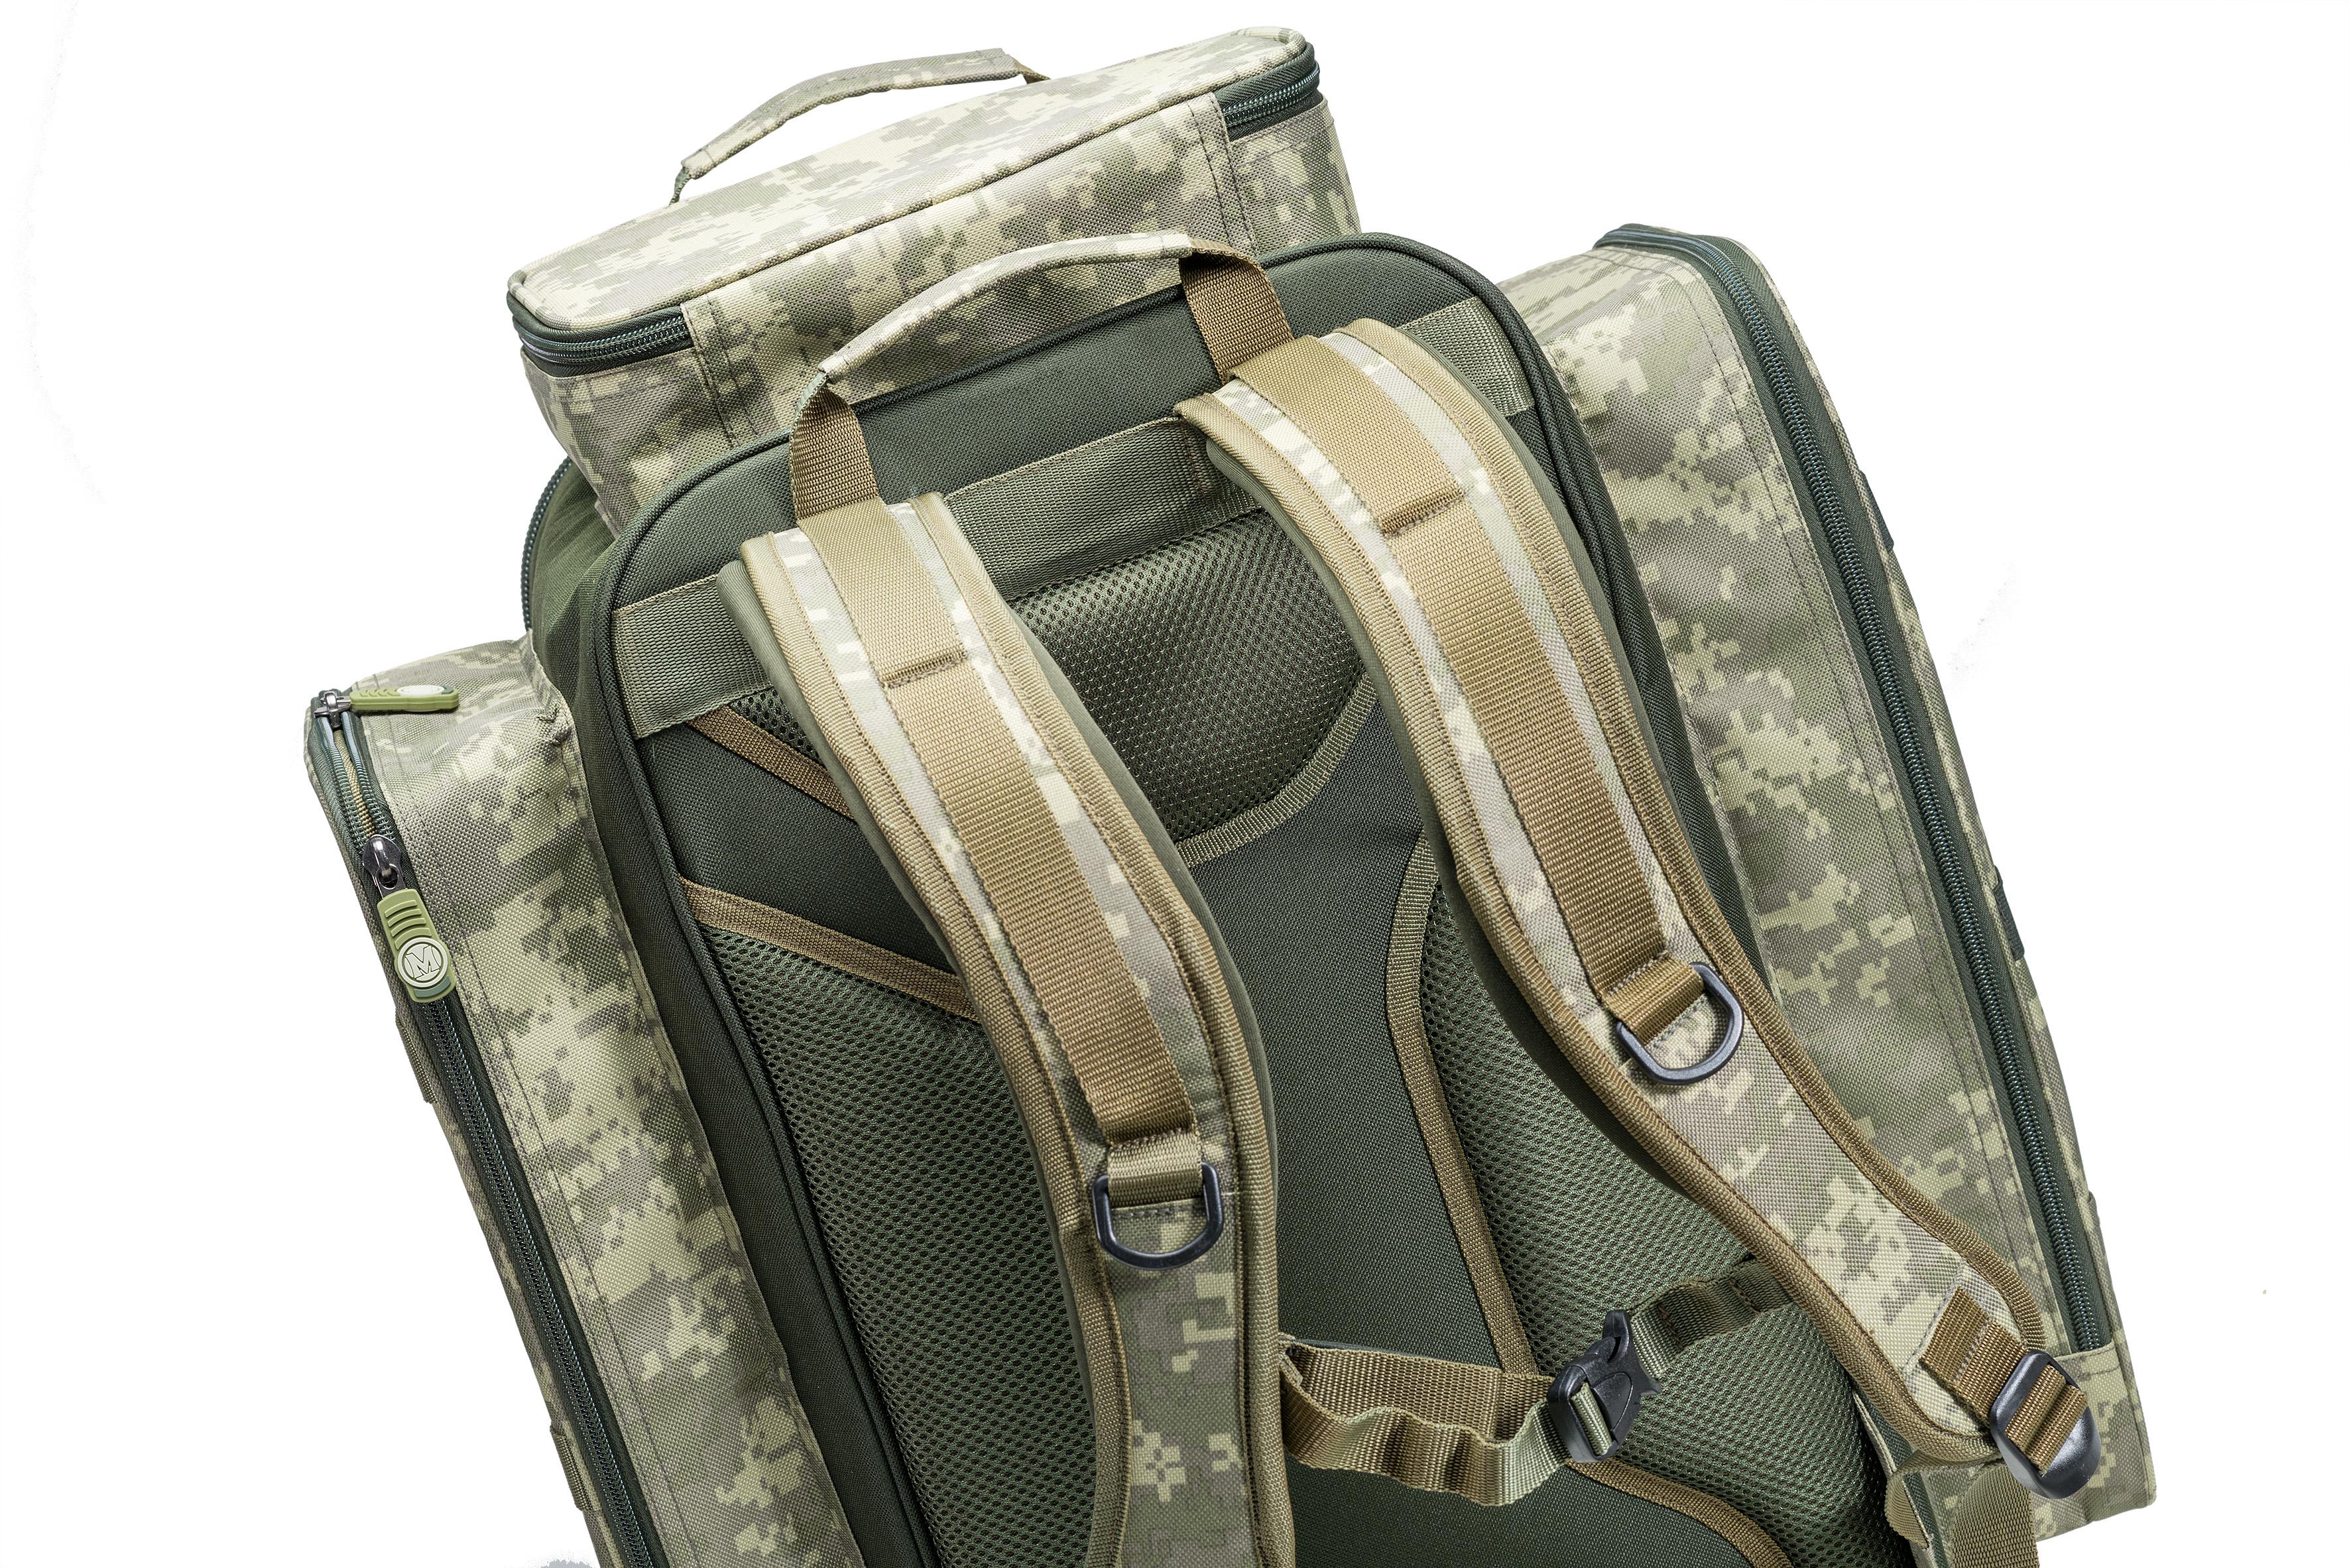 M-BPCCCXL Bagpack CamoCODE Cube XL